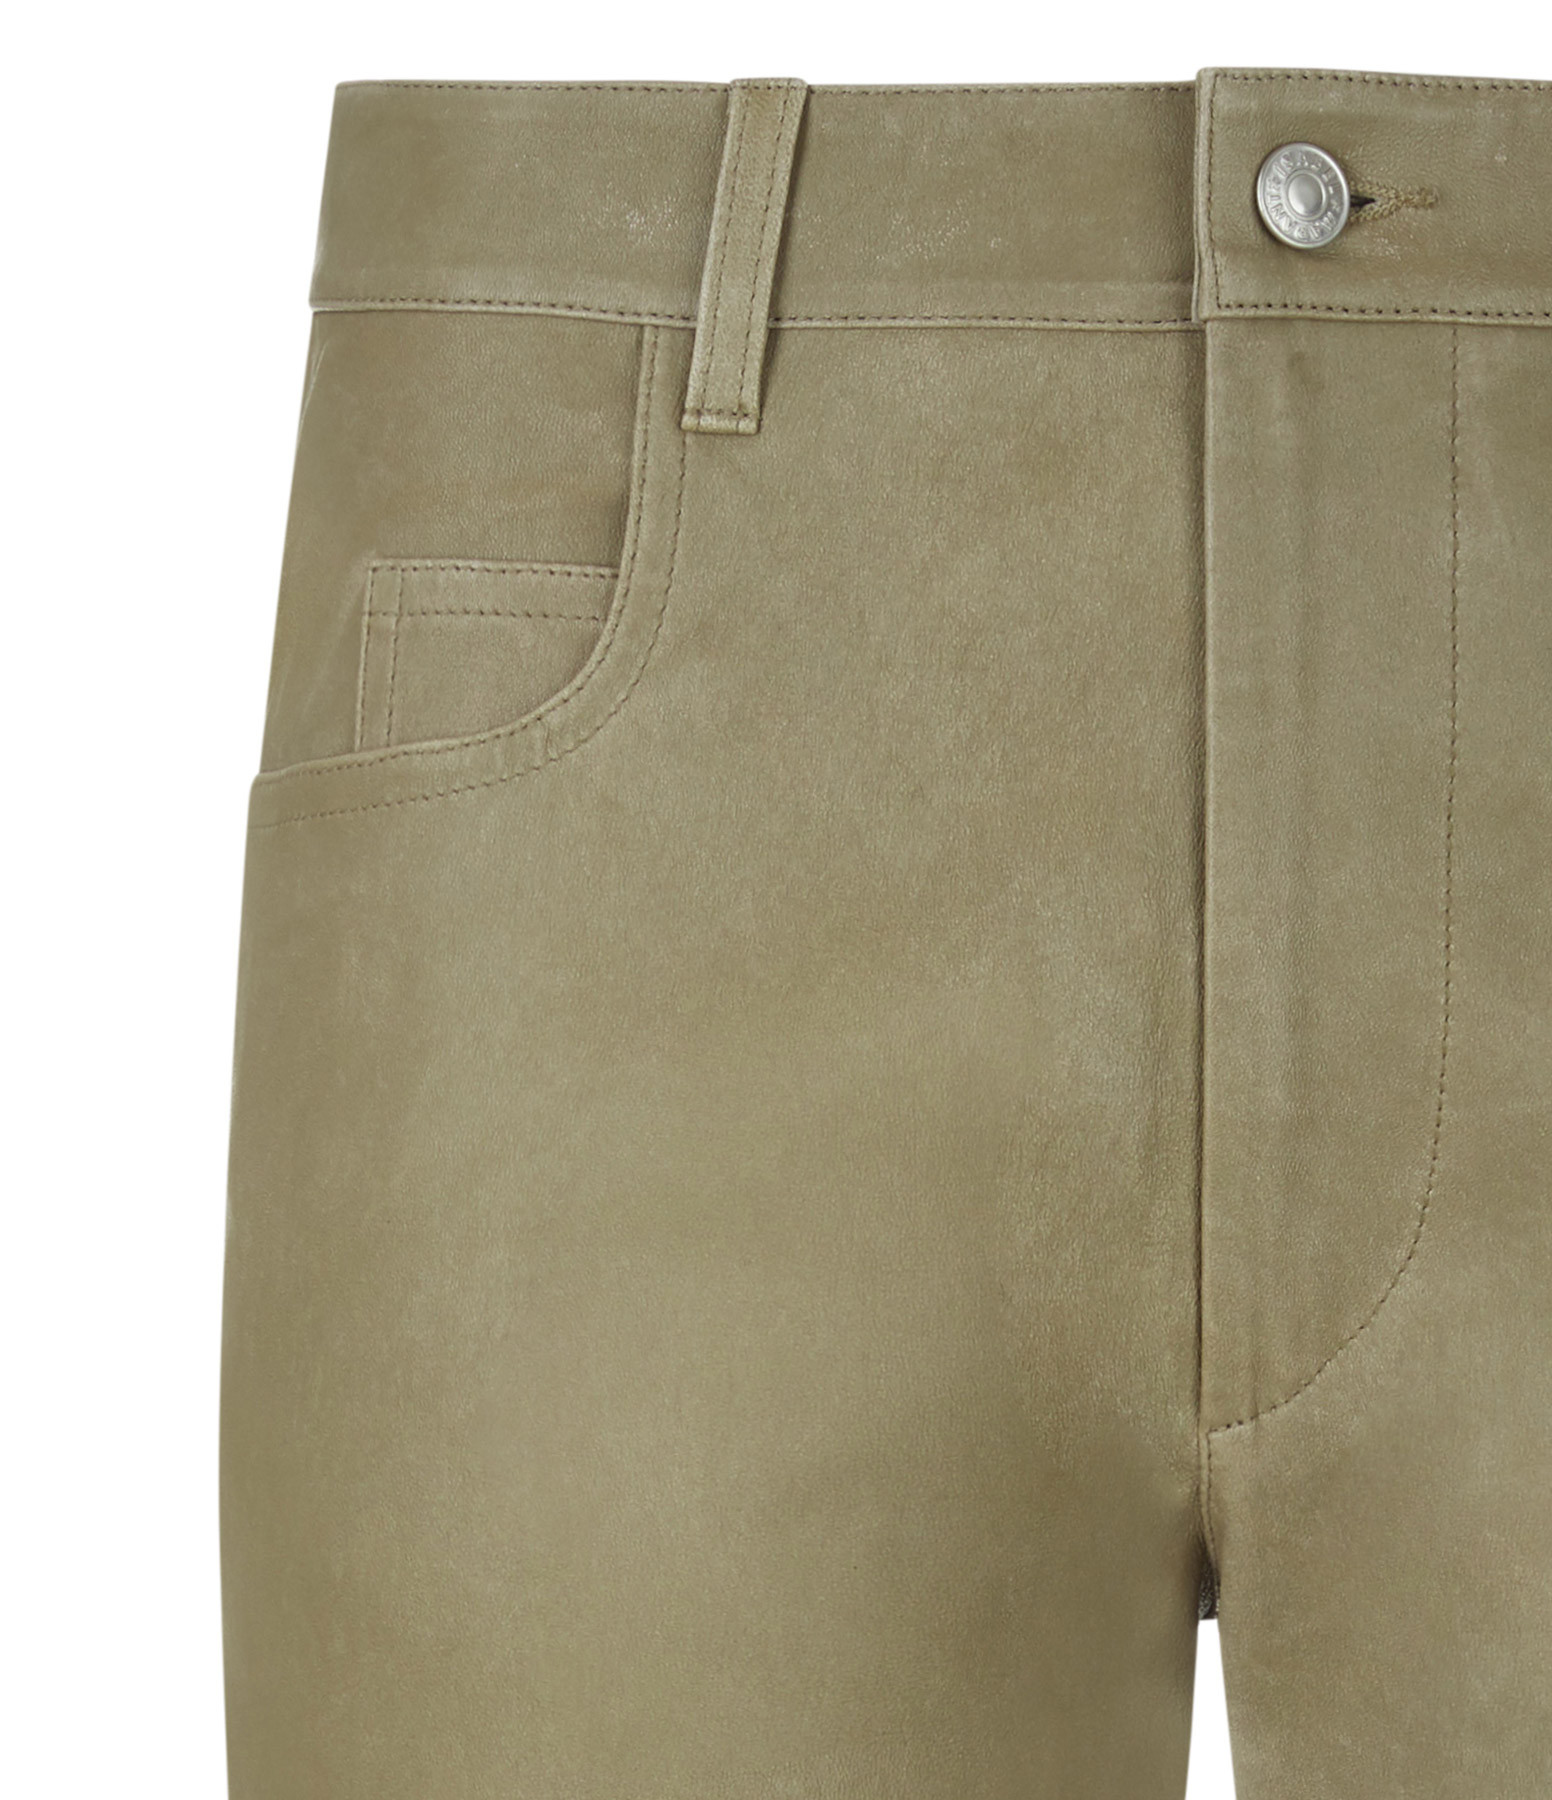 ISABEL MARANT ÉTOILE - Pantalon Tea Cuir Beige